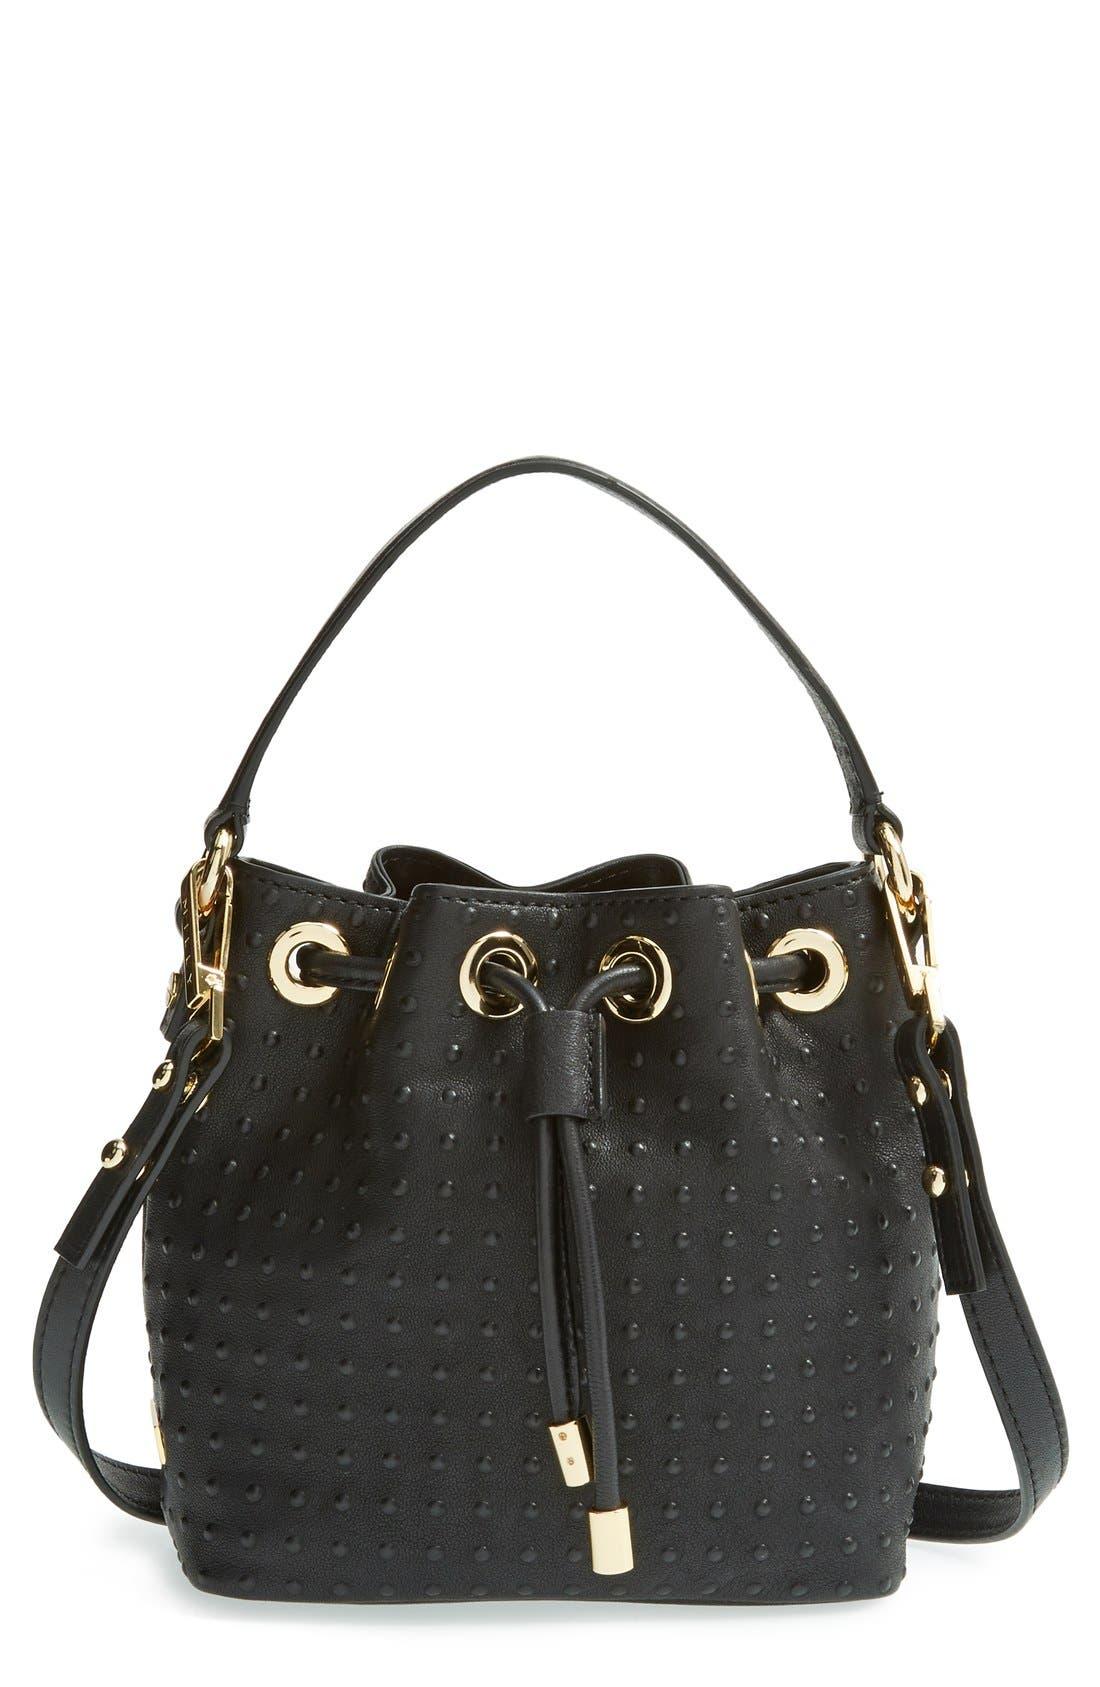 Main Image - Milly 'Mini Perry' Drawstring Bucket Bag